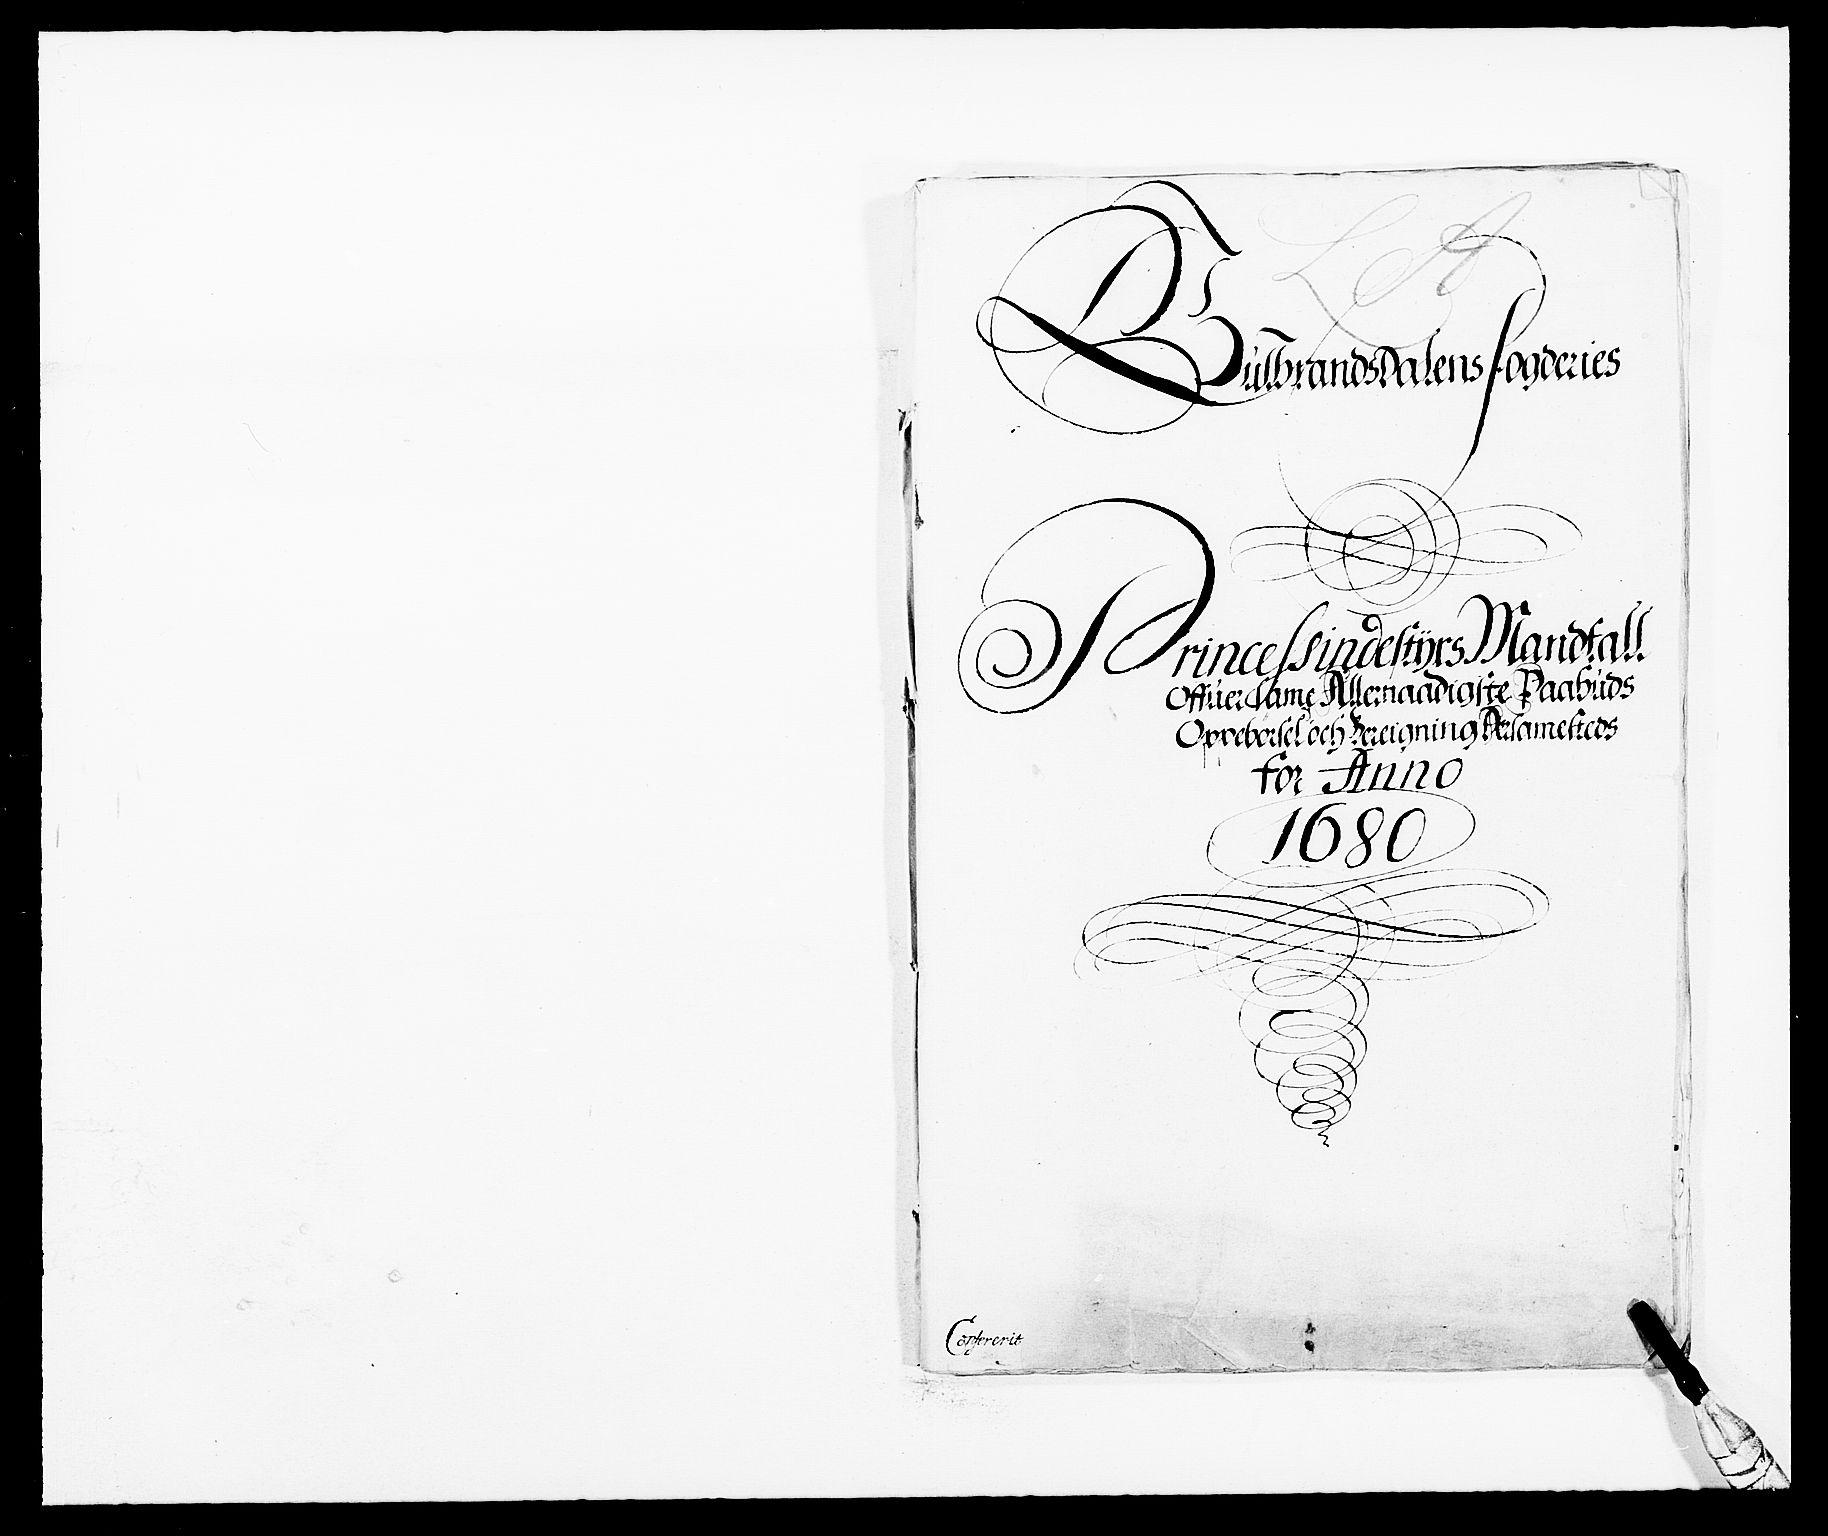 RA, Rentekammeret inntil 1814, Reviderte regnskaper, Fogderegnskap, R17/L1154: Fogderegnskap Gudbrandsdal, 1680, s. 177